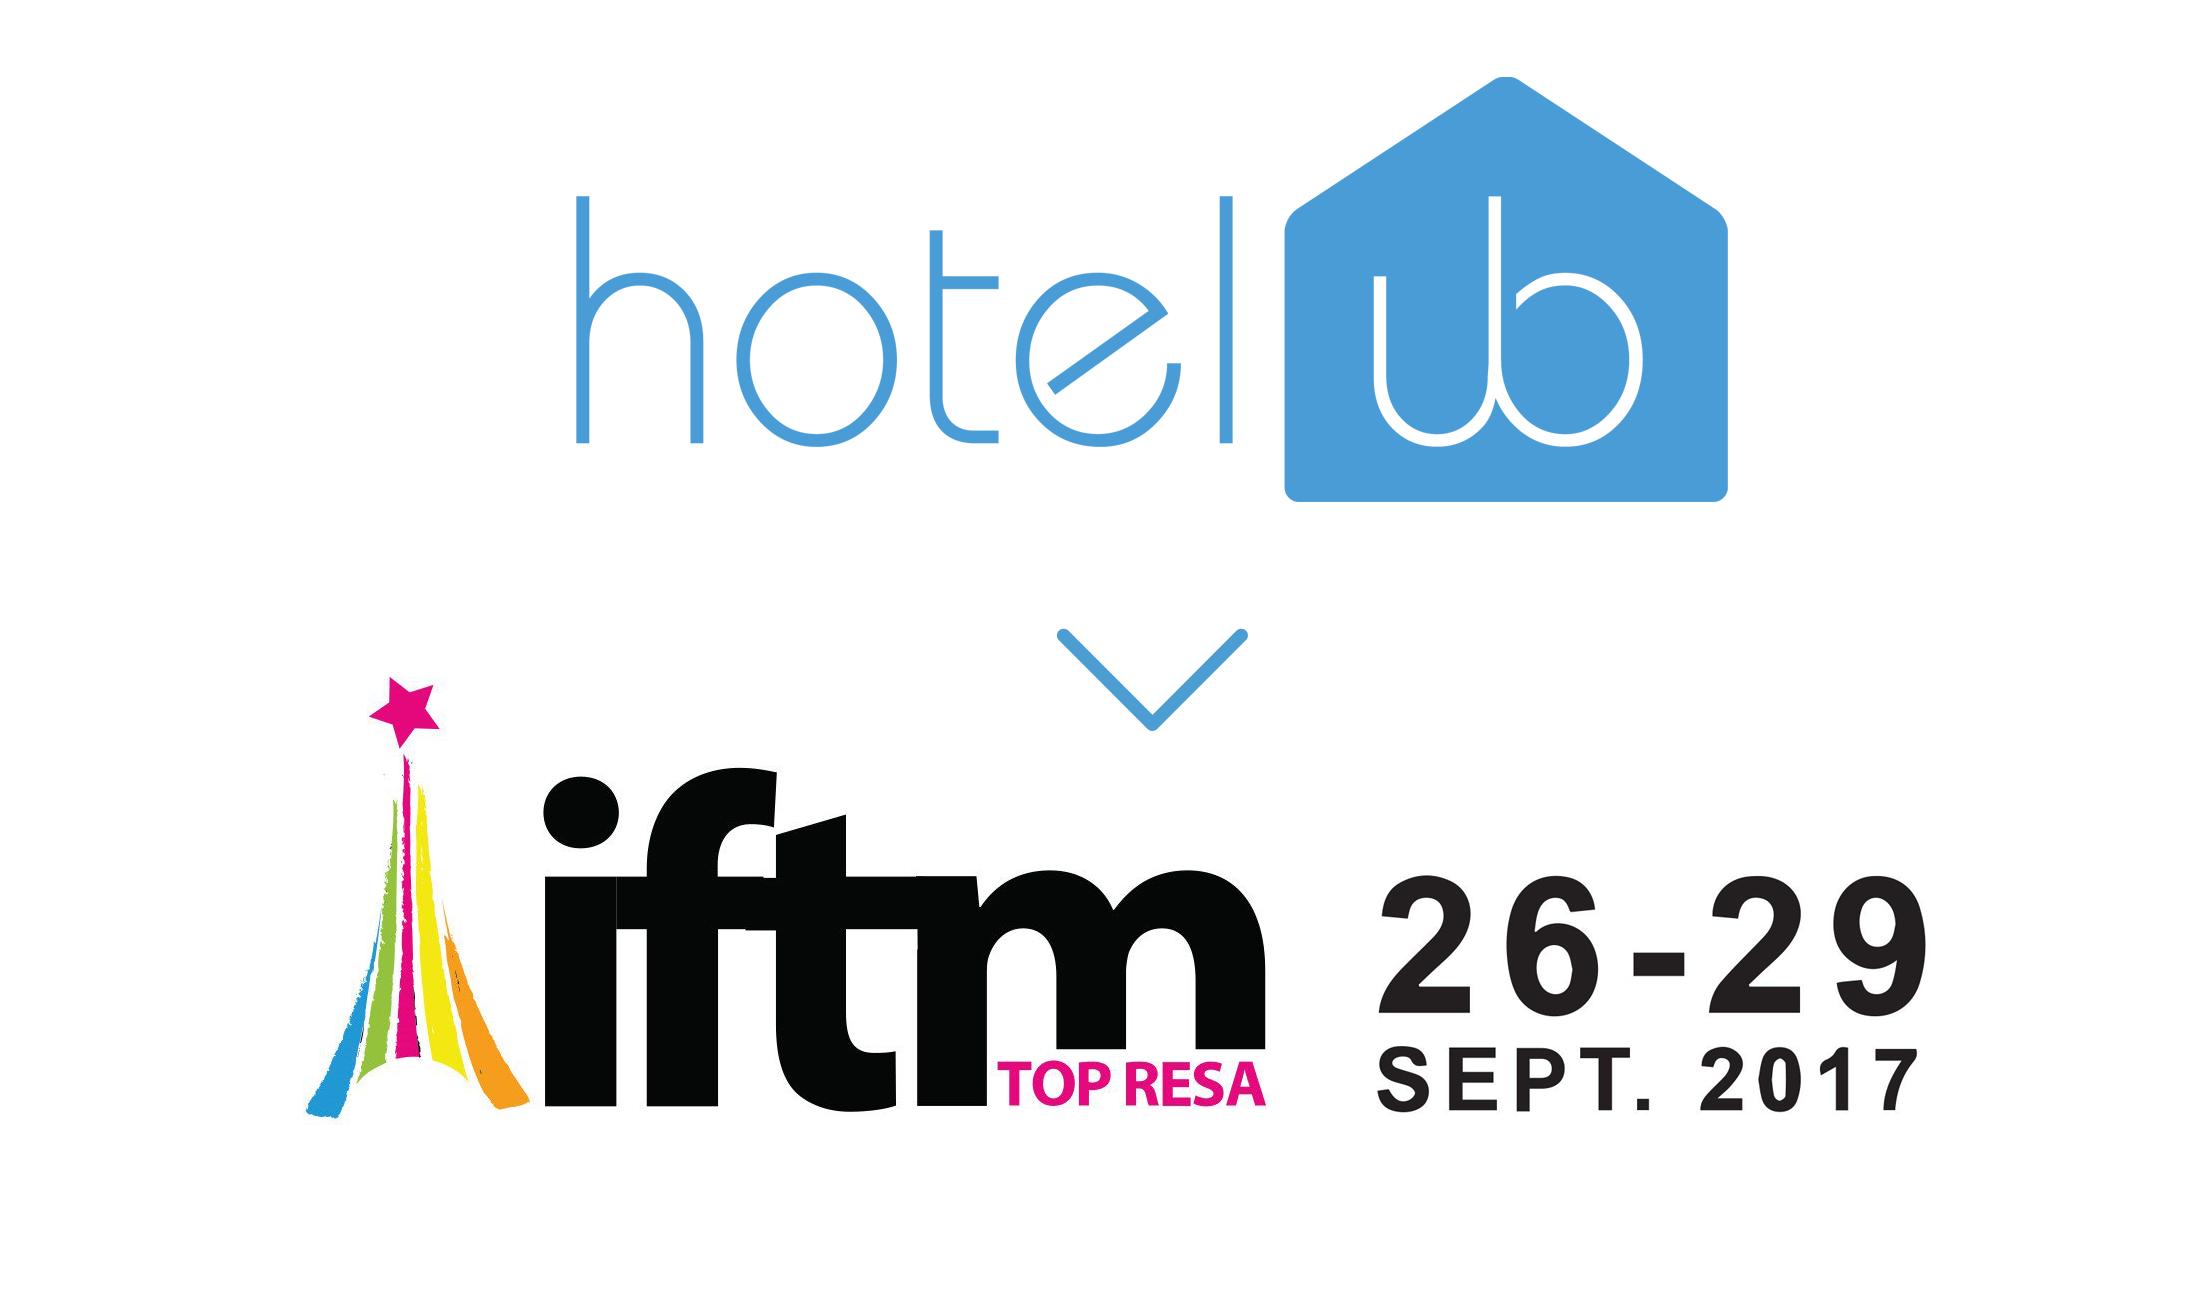 Hotelub IFTM 2017